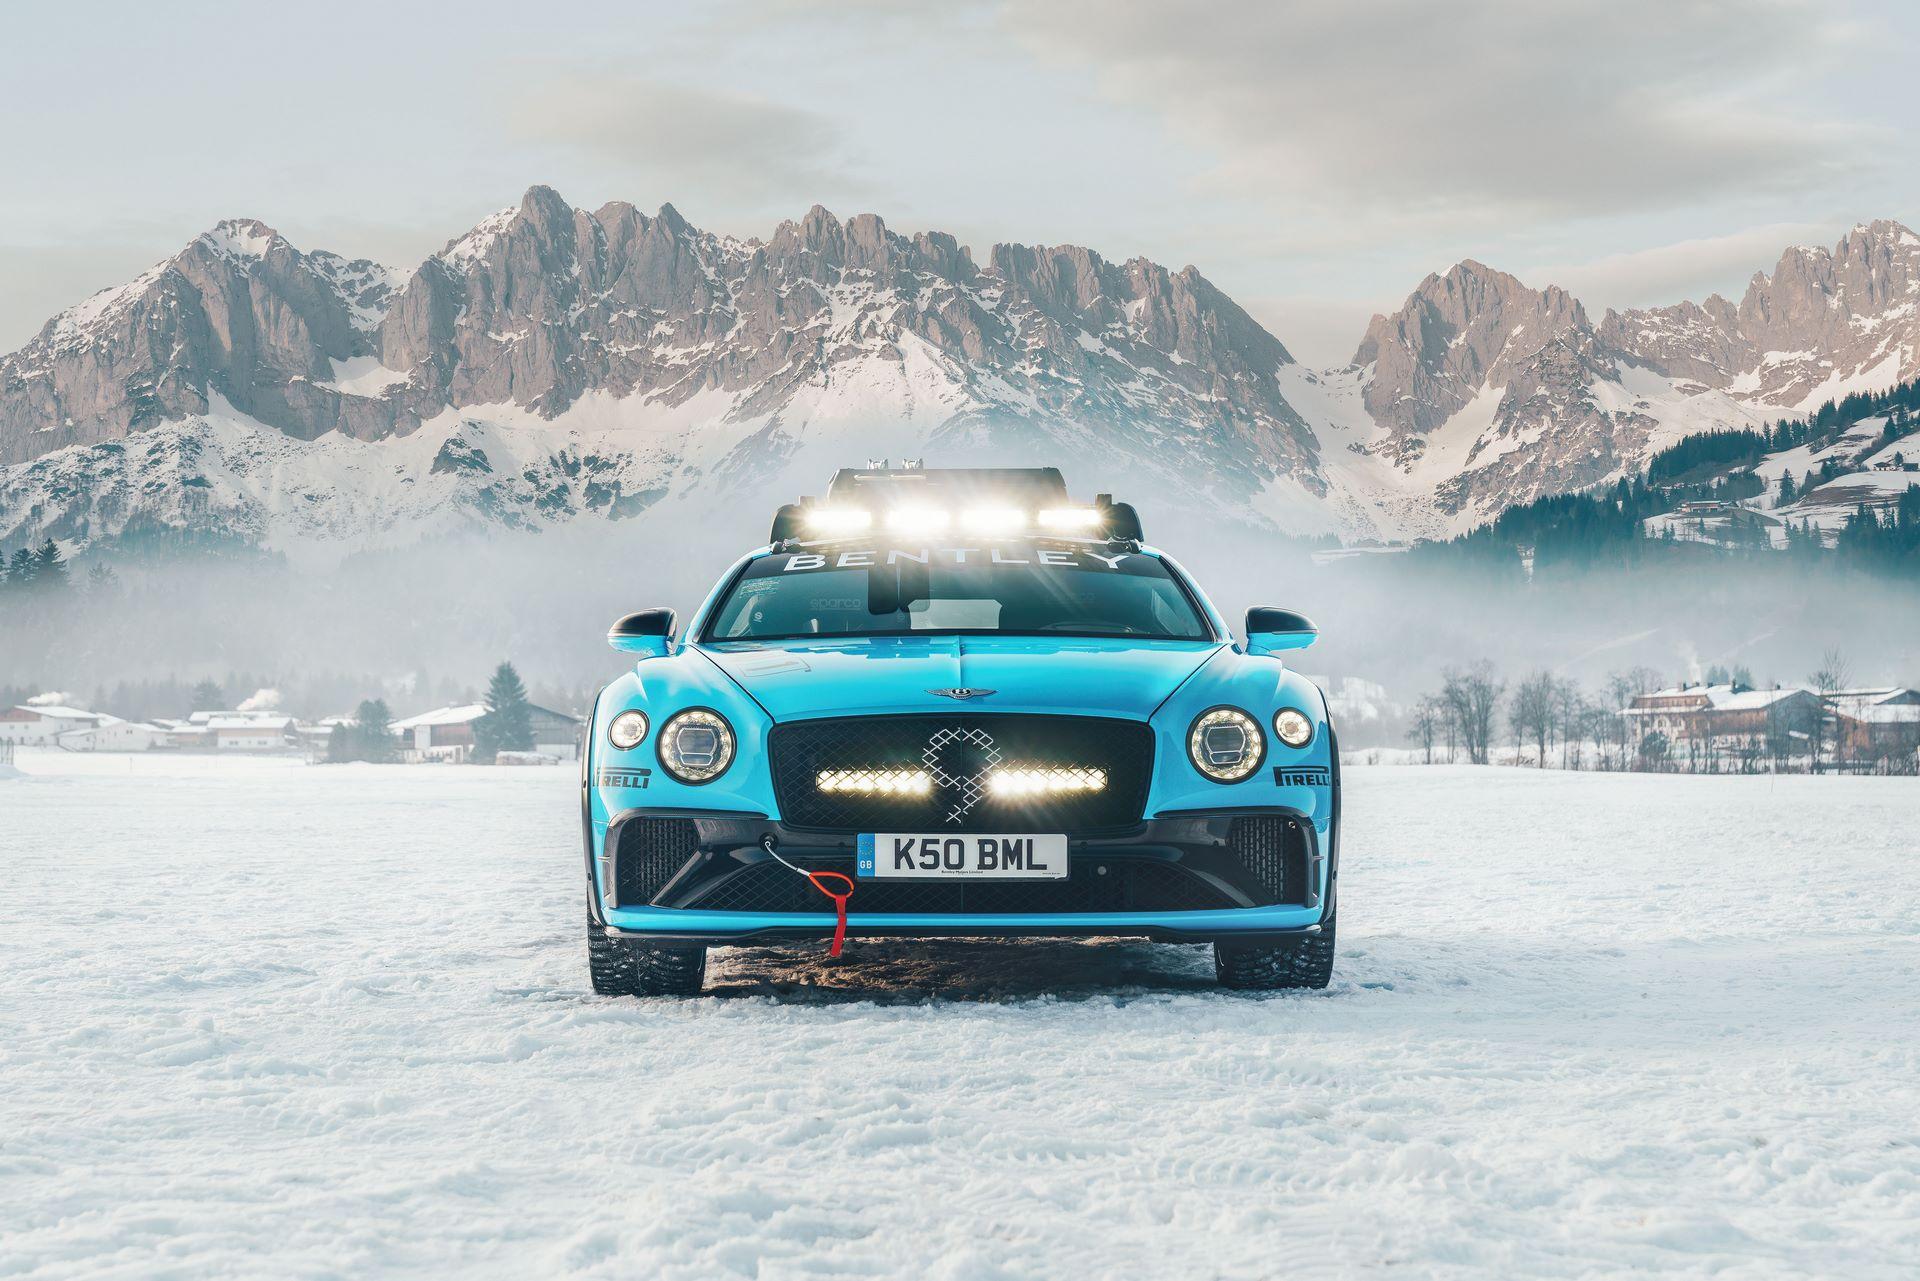 Bentley-Continental-GT-Ice-Race-2020-4